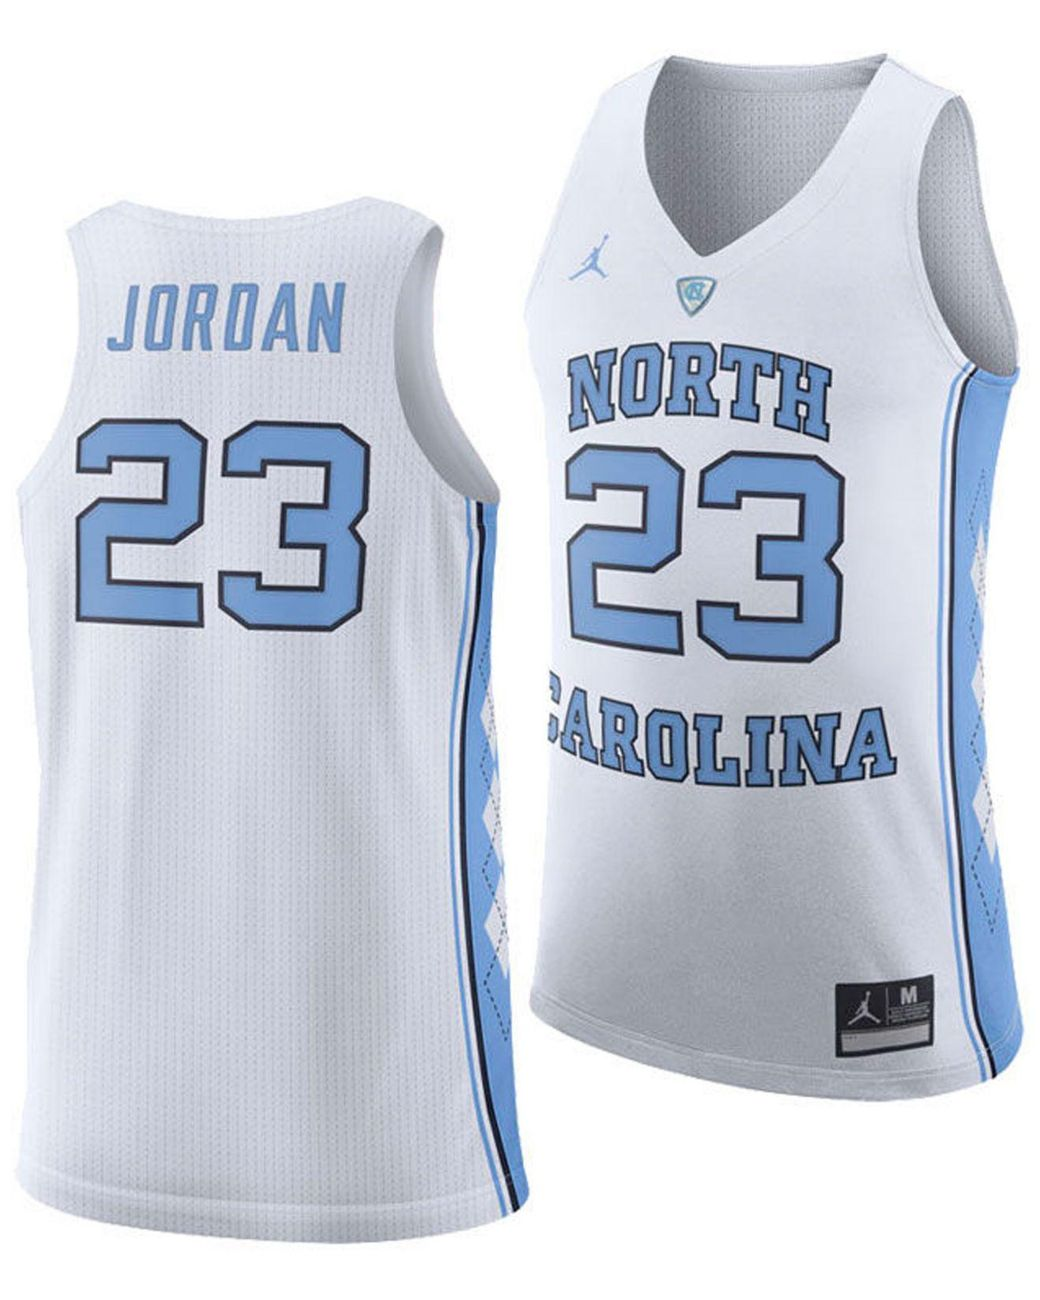 low priced e42ce f7803 Men's White Michael Jordan North Carolina Tar Heels Authentic Basketball  Jersey